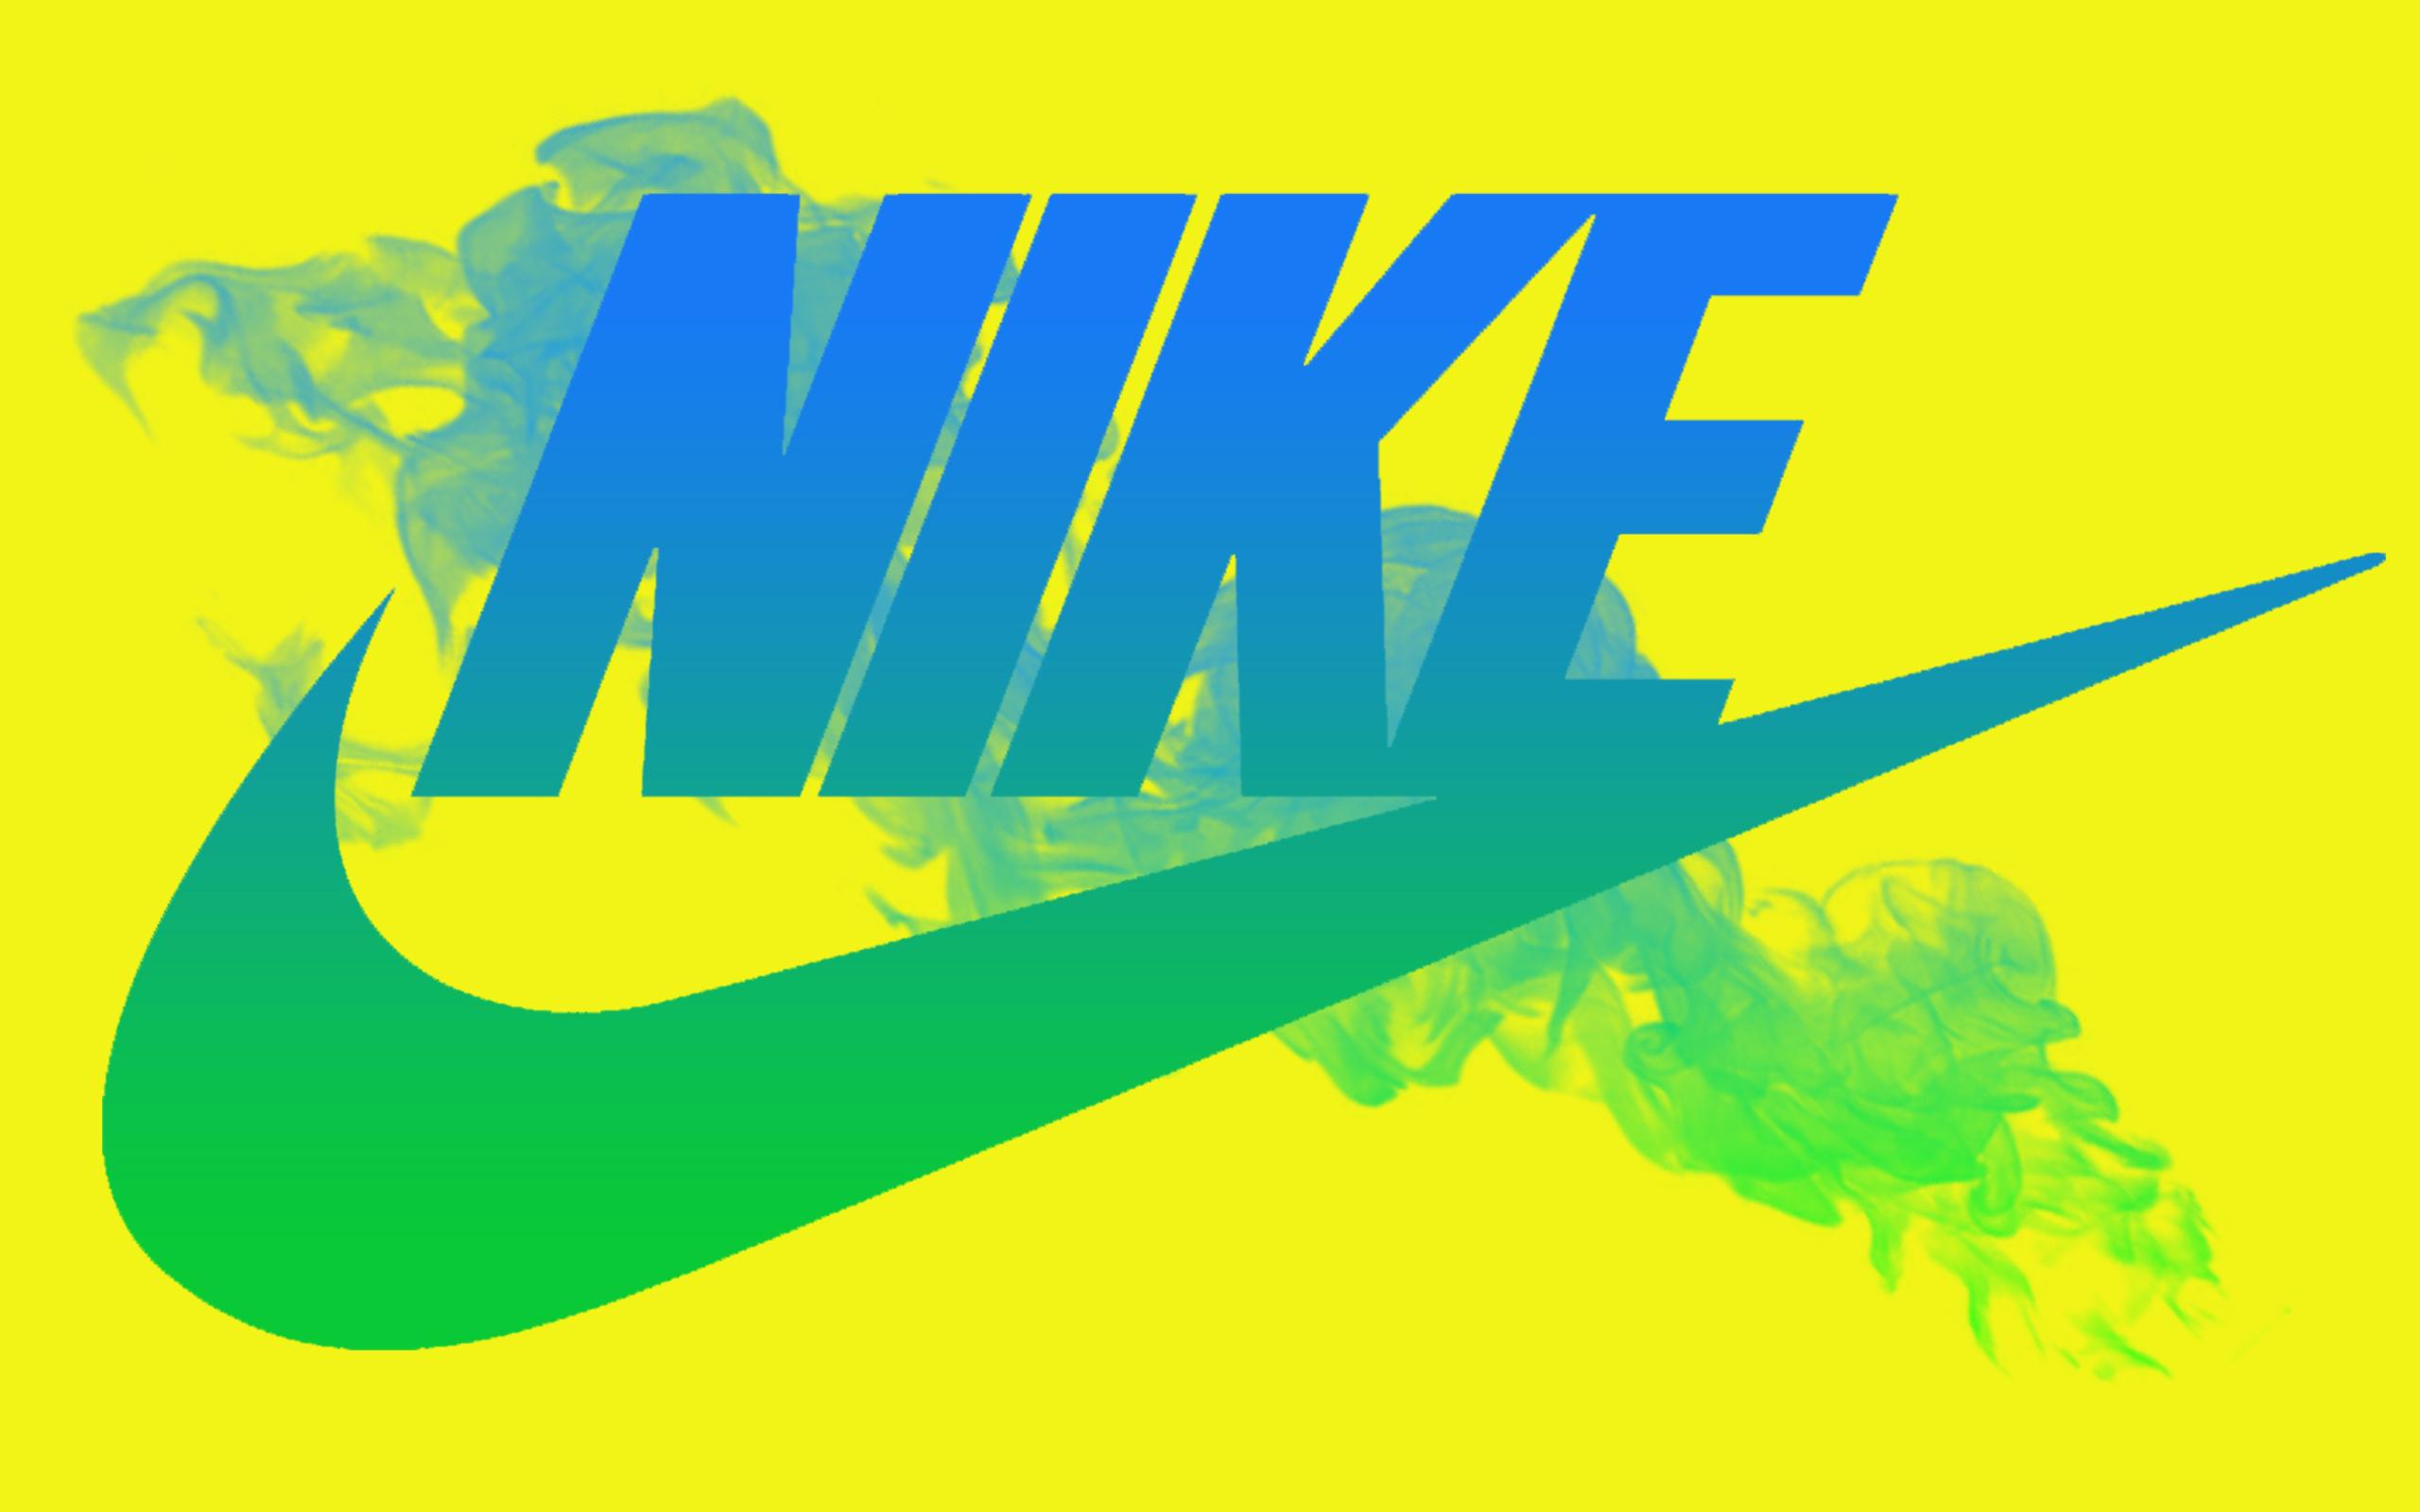 Nike Wallpapers Neon Nike Myspace Backgrounds Neon Nike Backgrounds 2560x1600